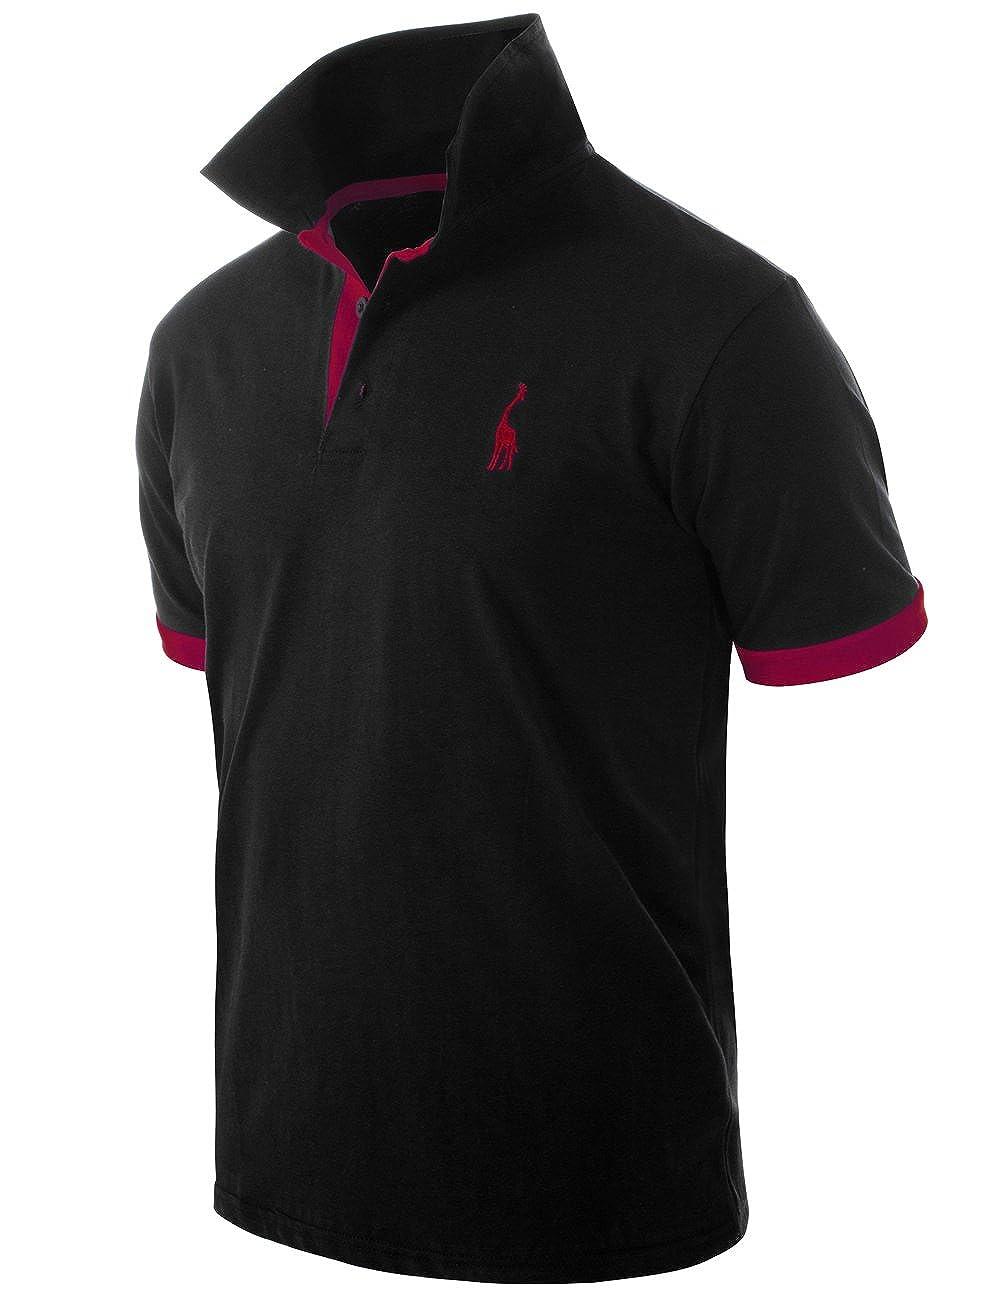 935a89752 Glestore Mens Polo Shirts Giraffe MT1030 Golf Tennis T-Shirt: Amazon.co.uk:  Clothing